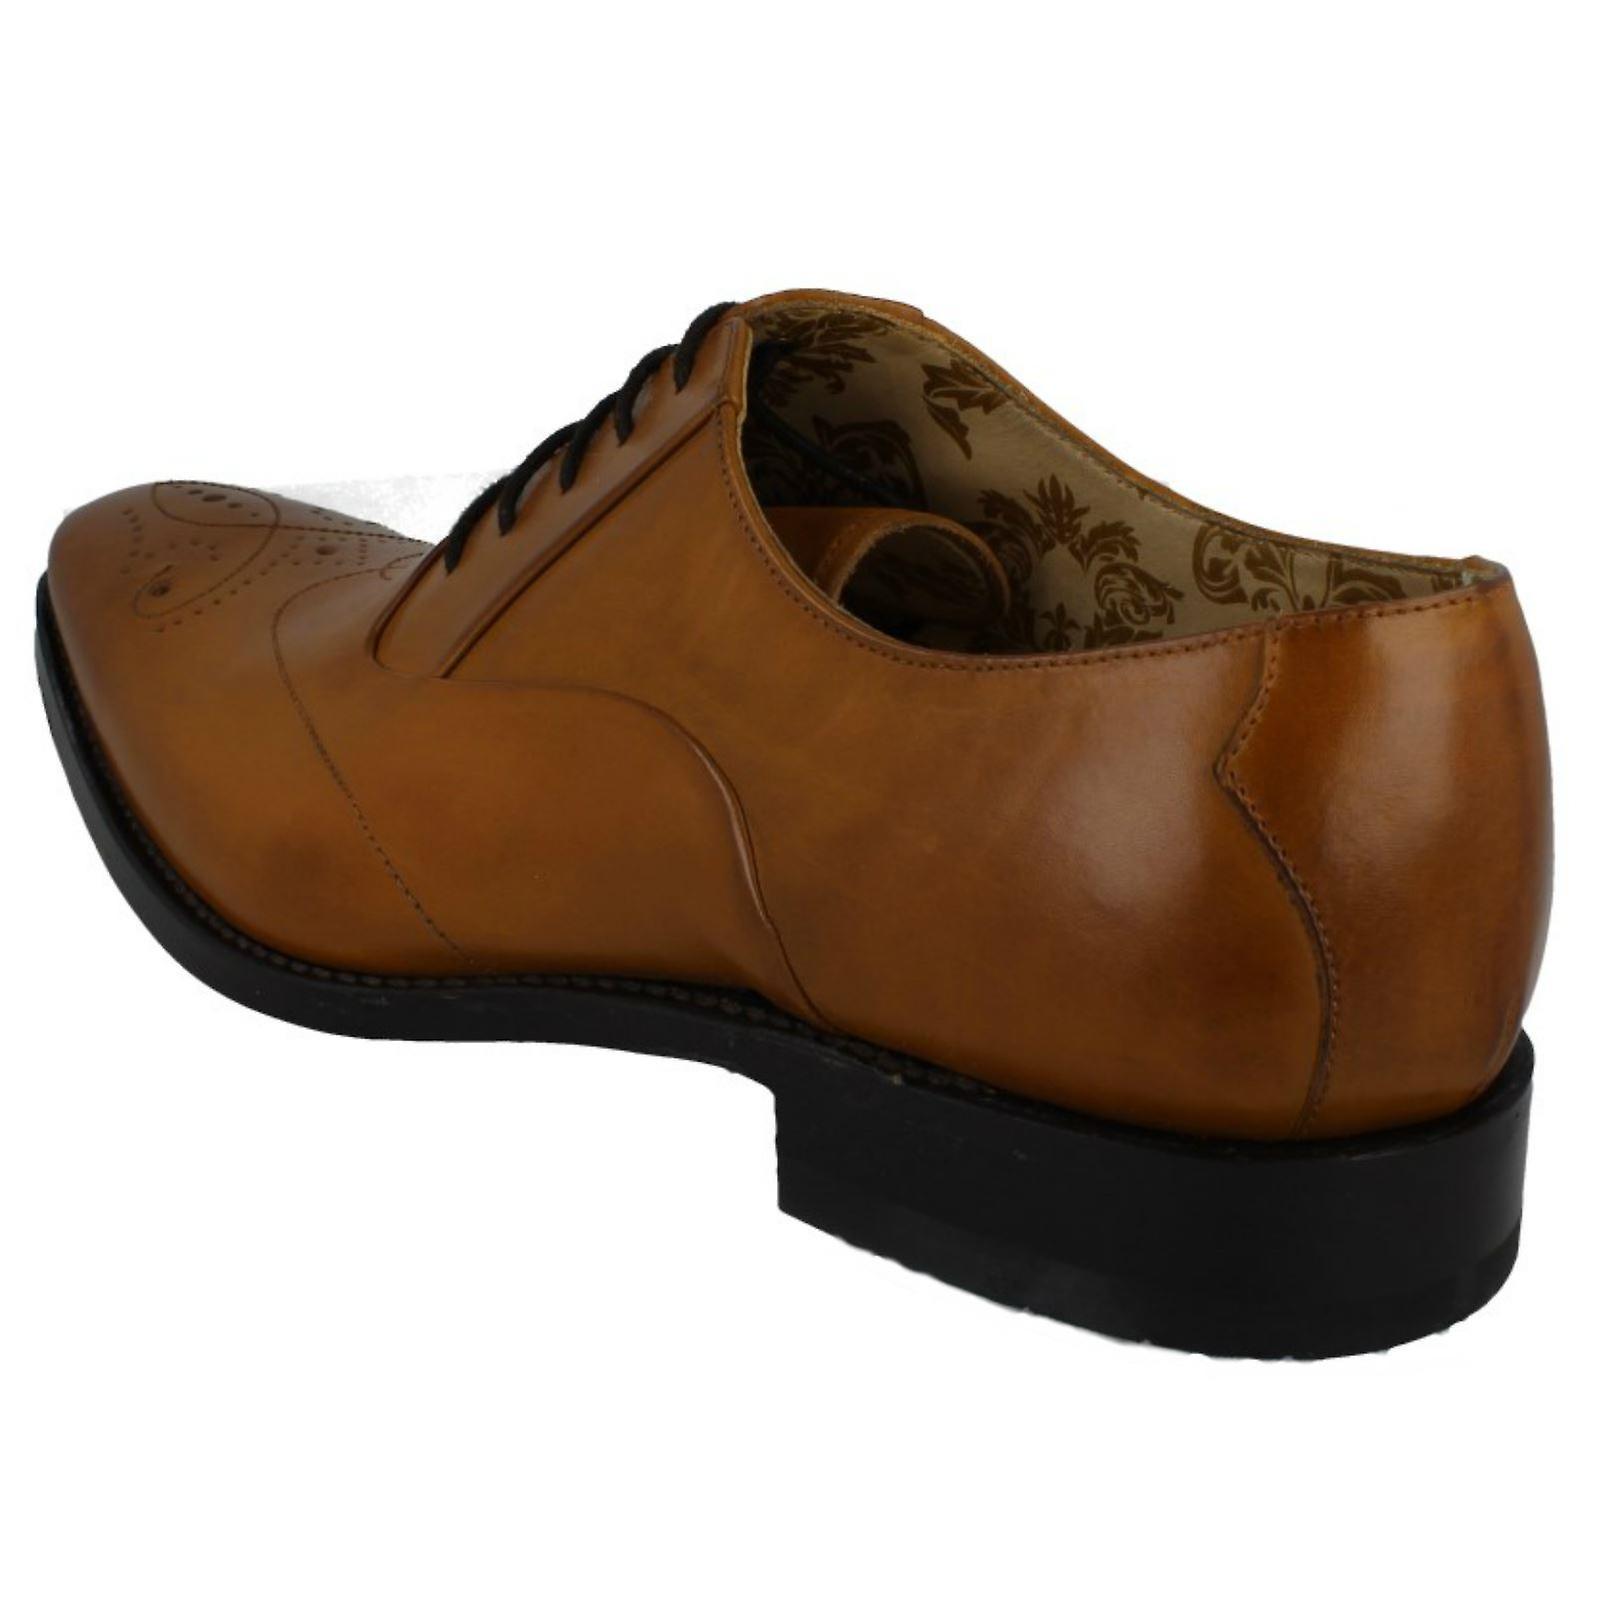 STRINGATE in pelle Smart Mens Loake scarpe Gunny sVVAsT